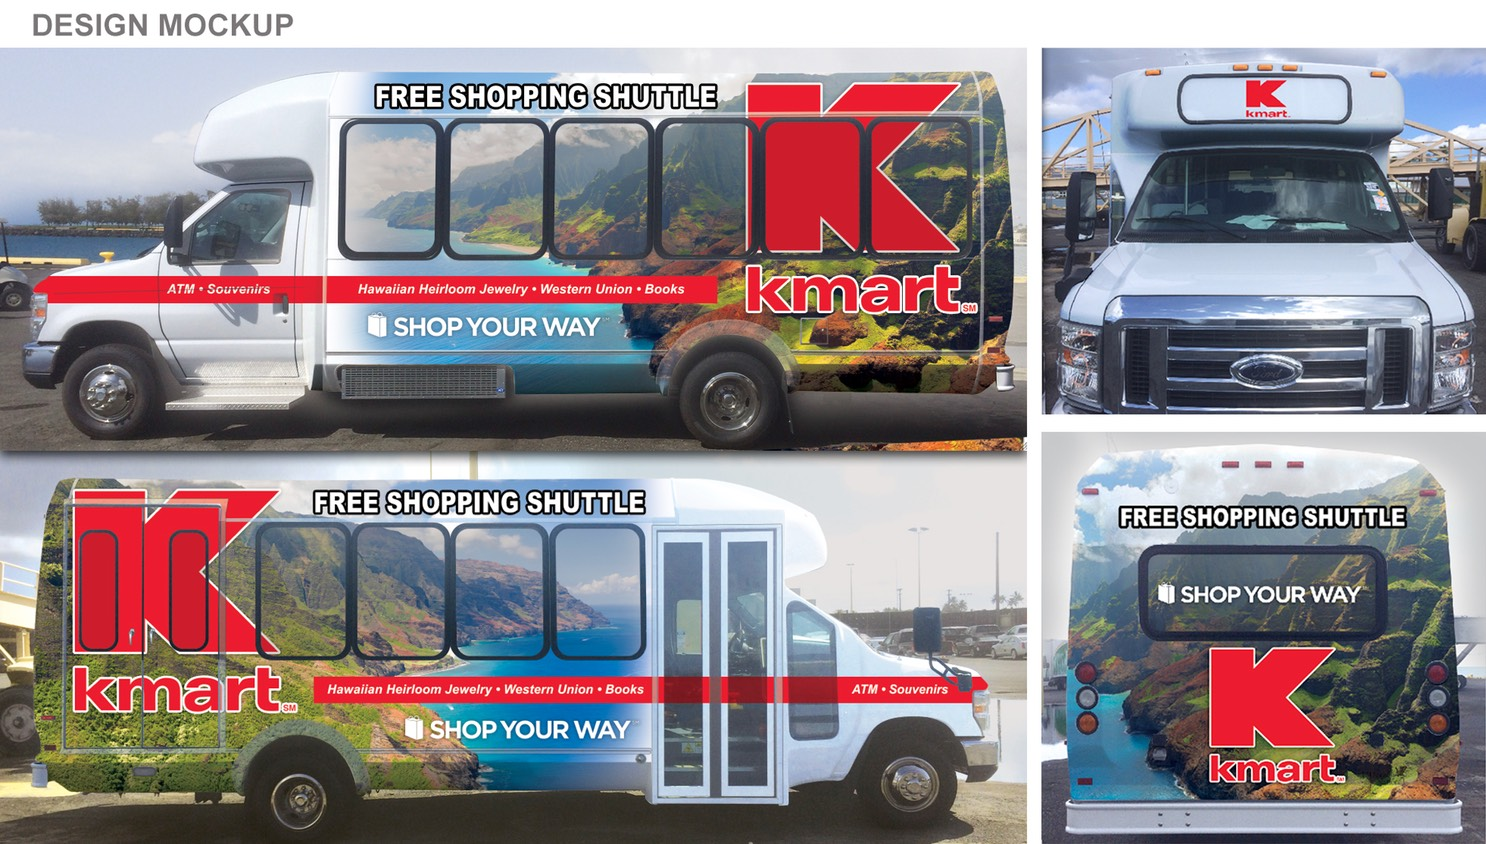 Kmart Kauai Bus Design Concept